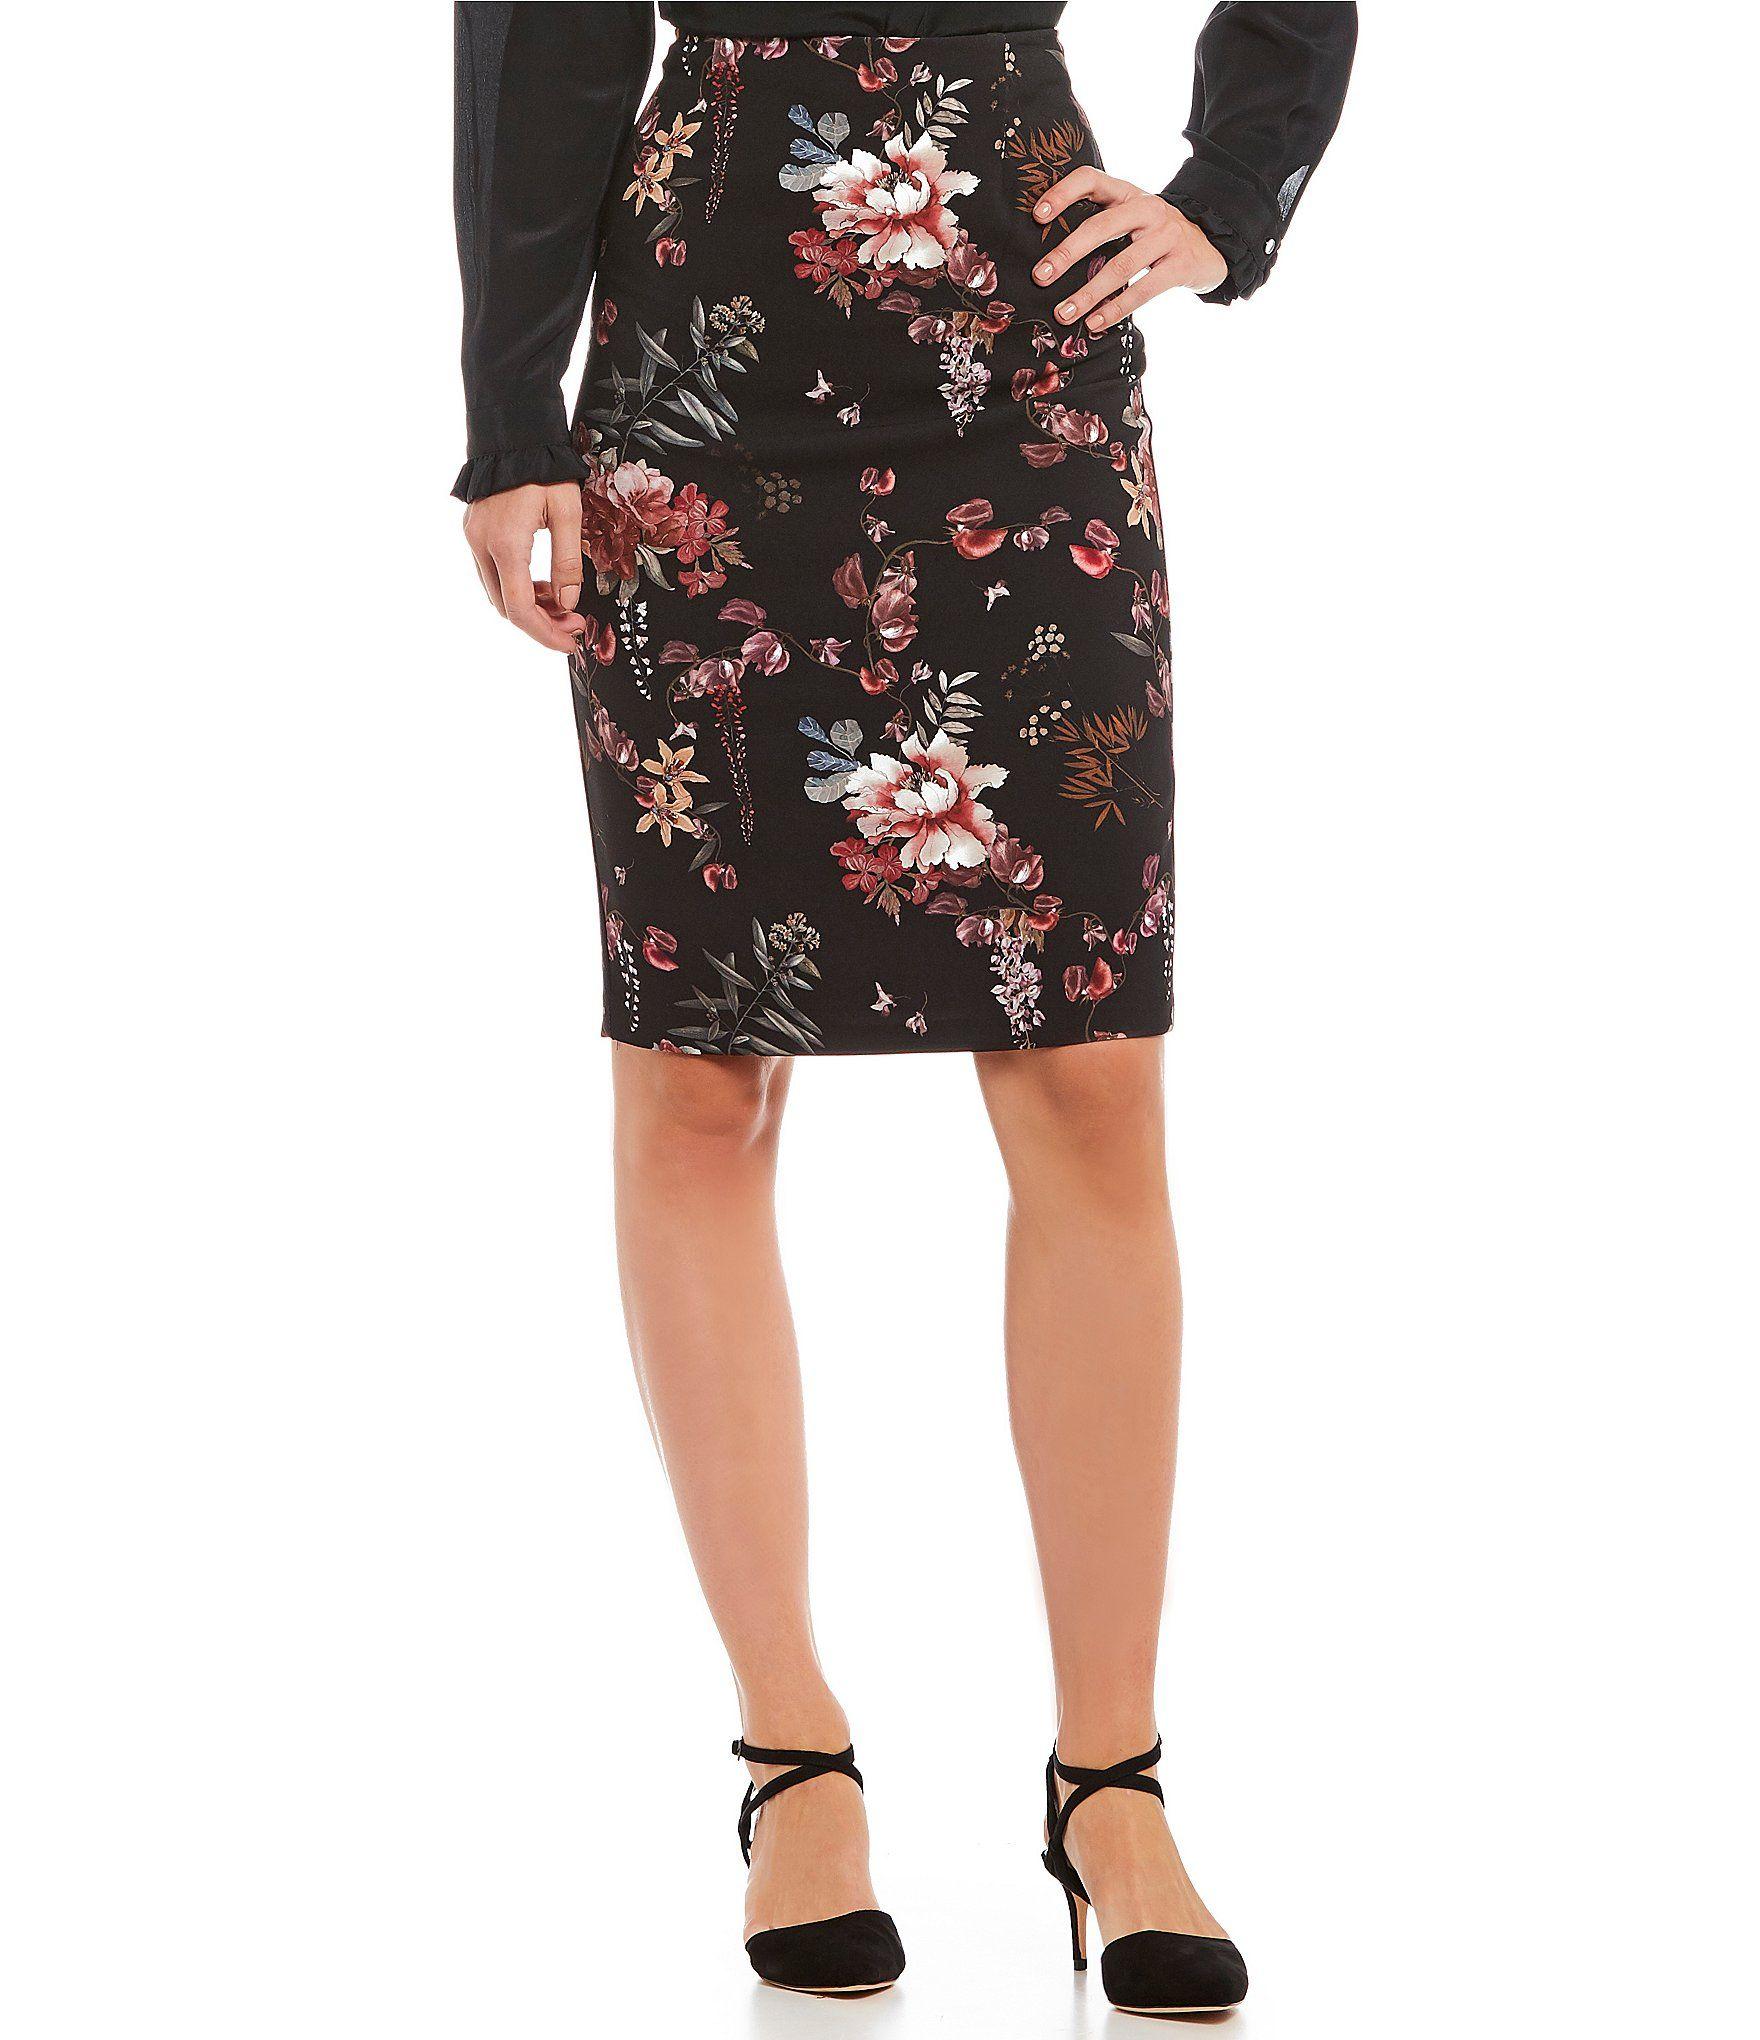 71732b70a7 Antonio Melani Crepe Tami Floral Print Pencil Skirt #Dillards | Skirts